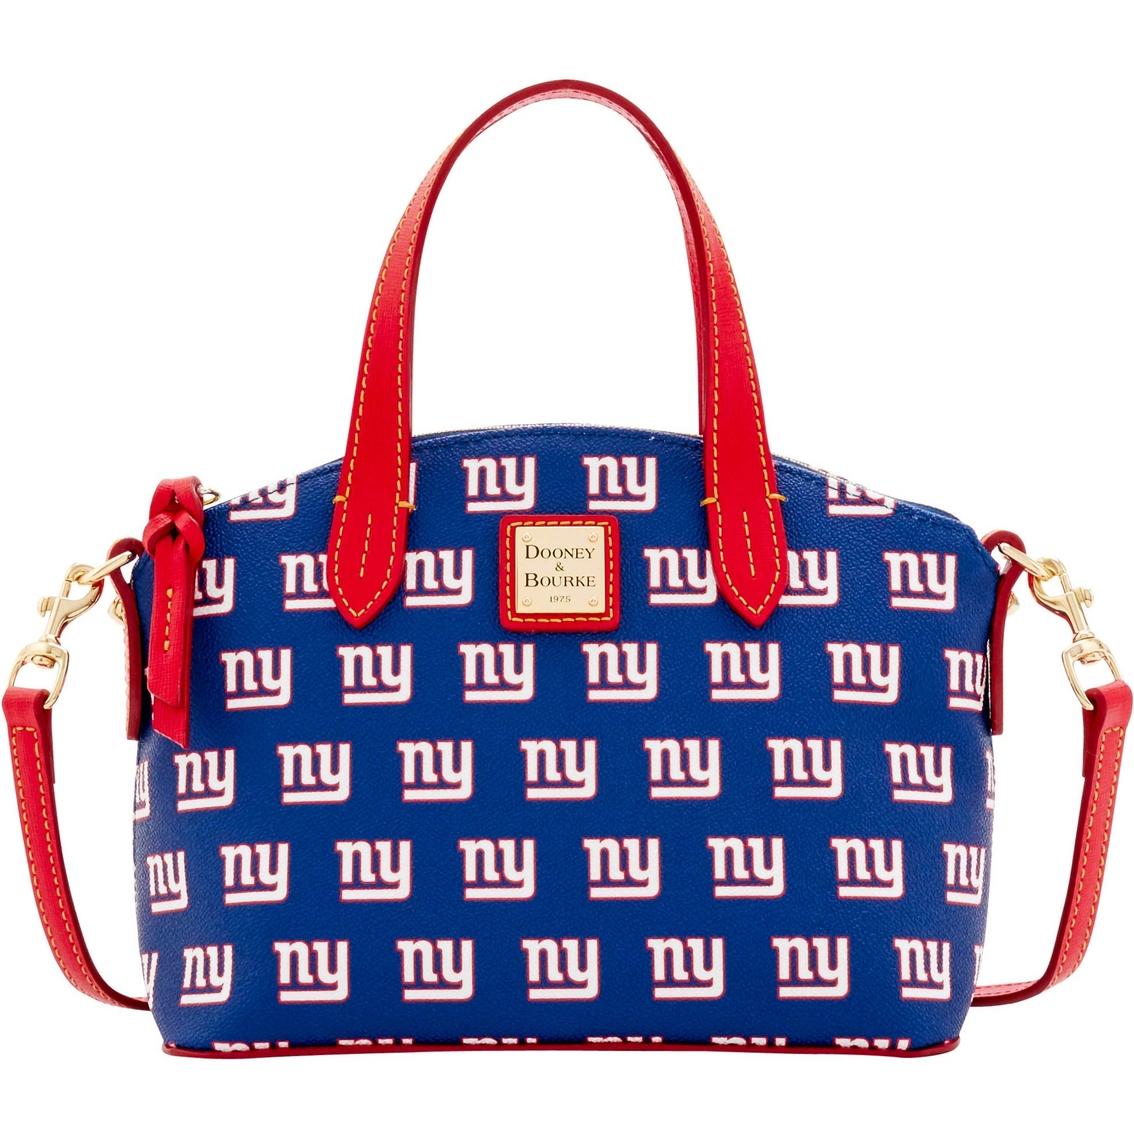 Dooney Bourke Nfl New York Giants Ruby Bag